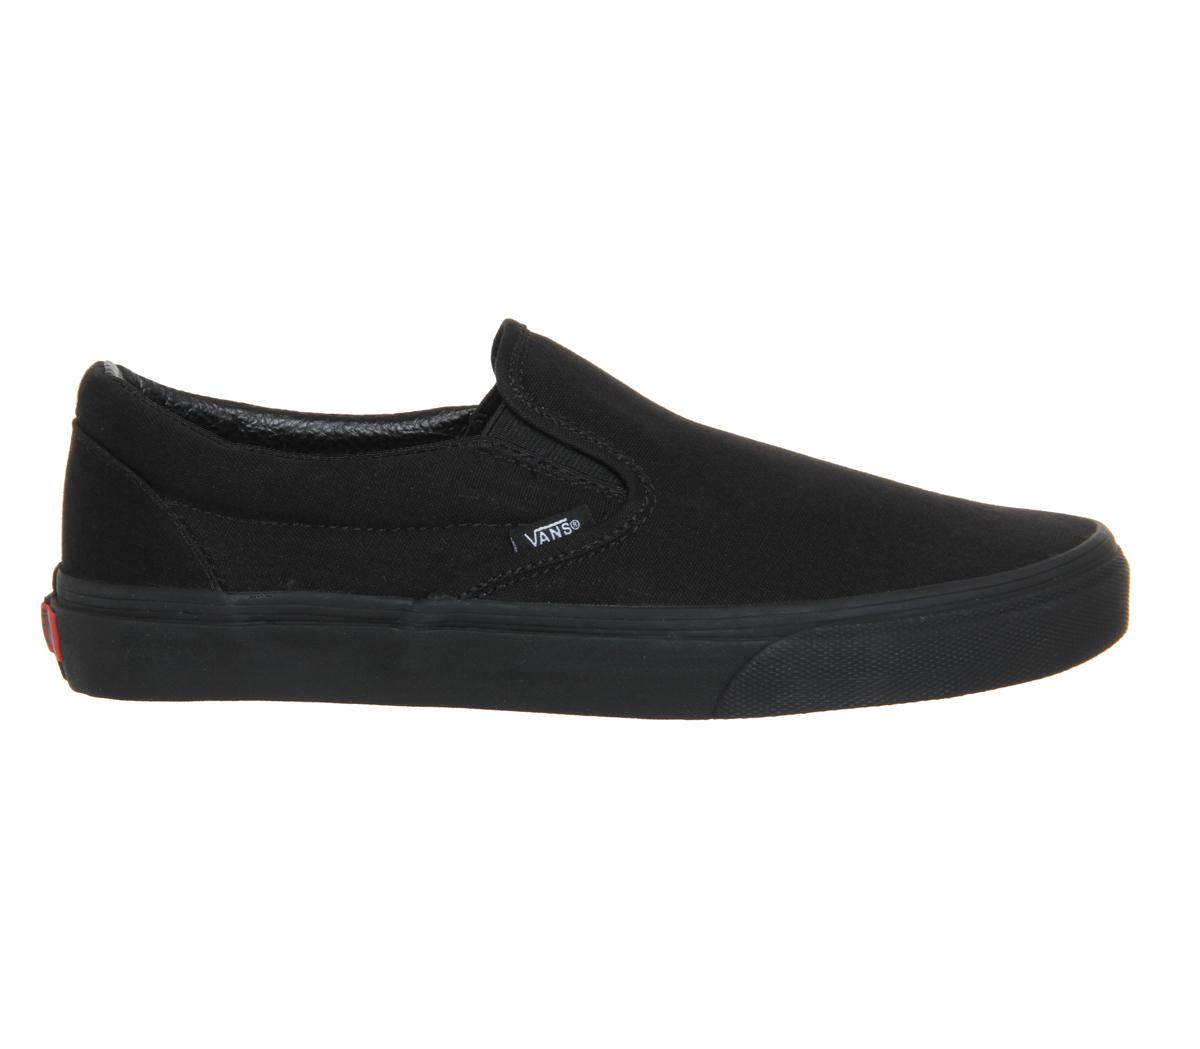 44c3a46d0aa CENTINELA Hombres Vans Classic Slip instructores formadores MONO negro  zapatos